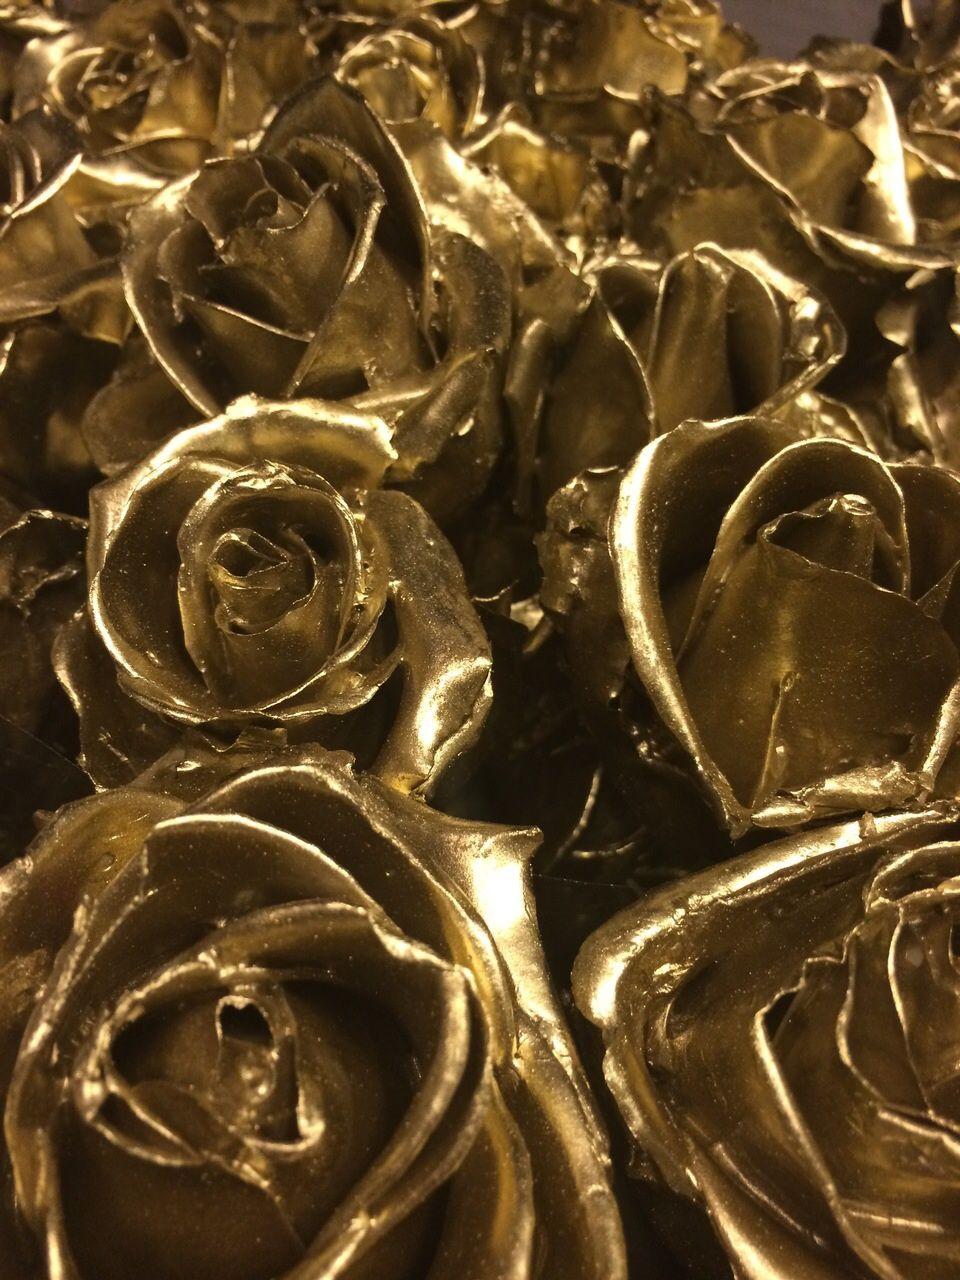 Waxes roses!